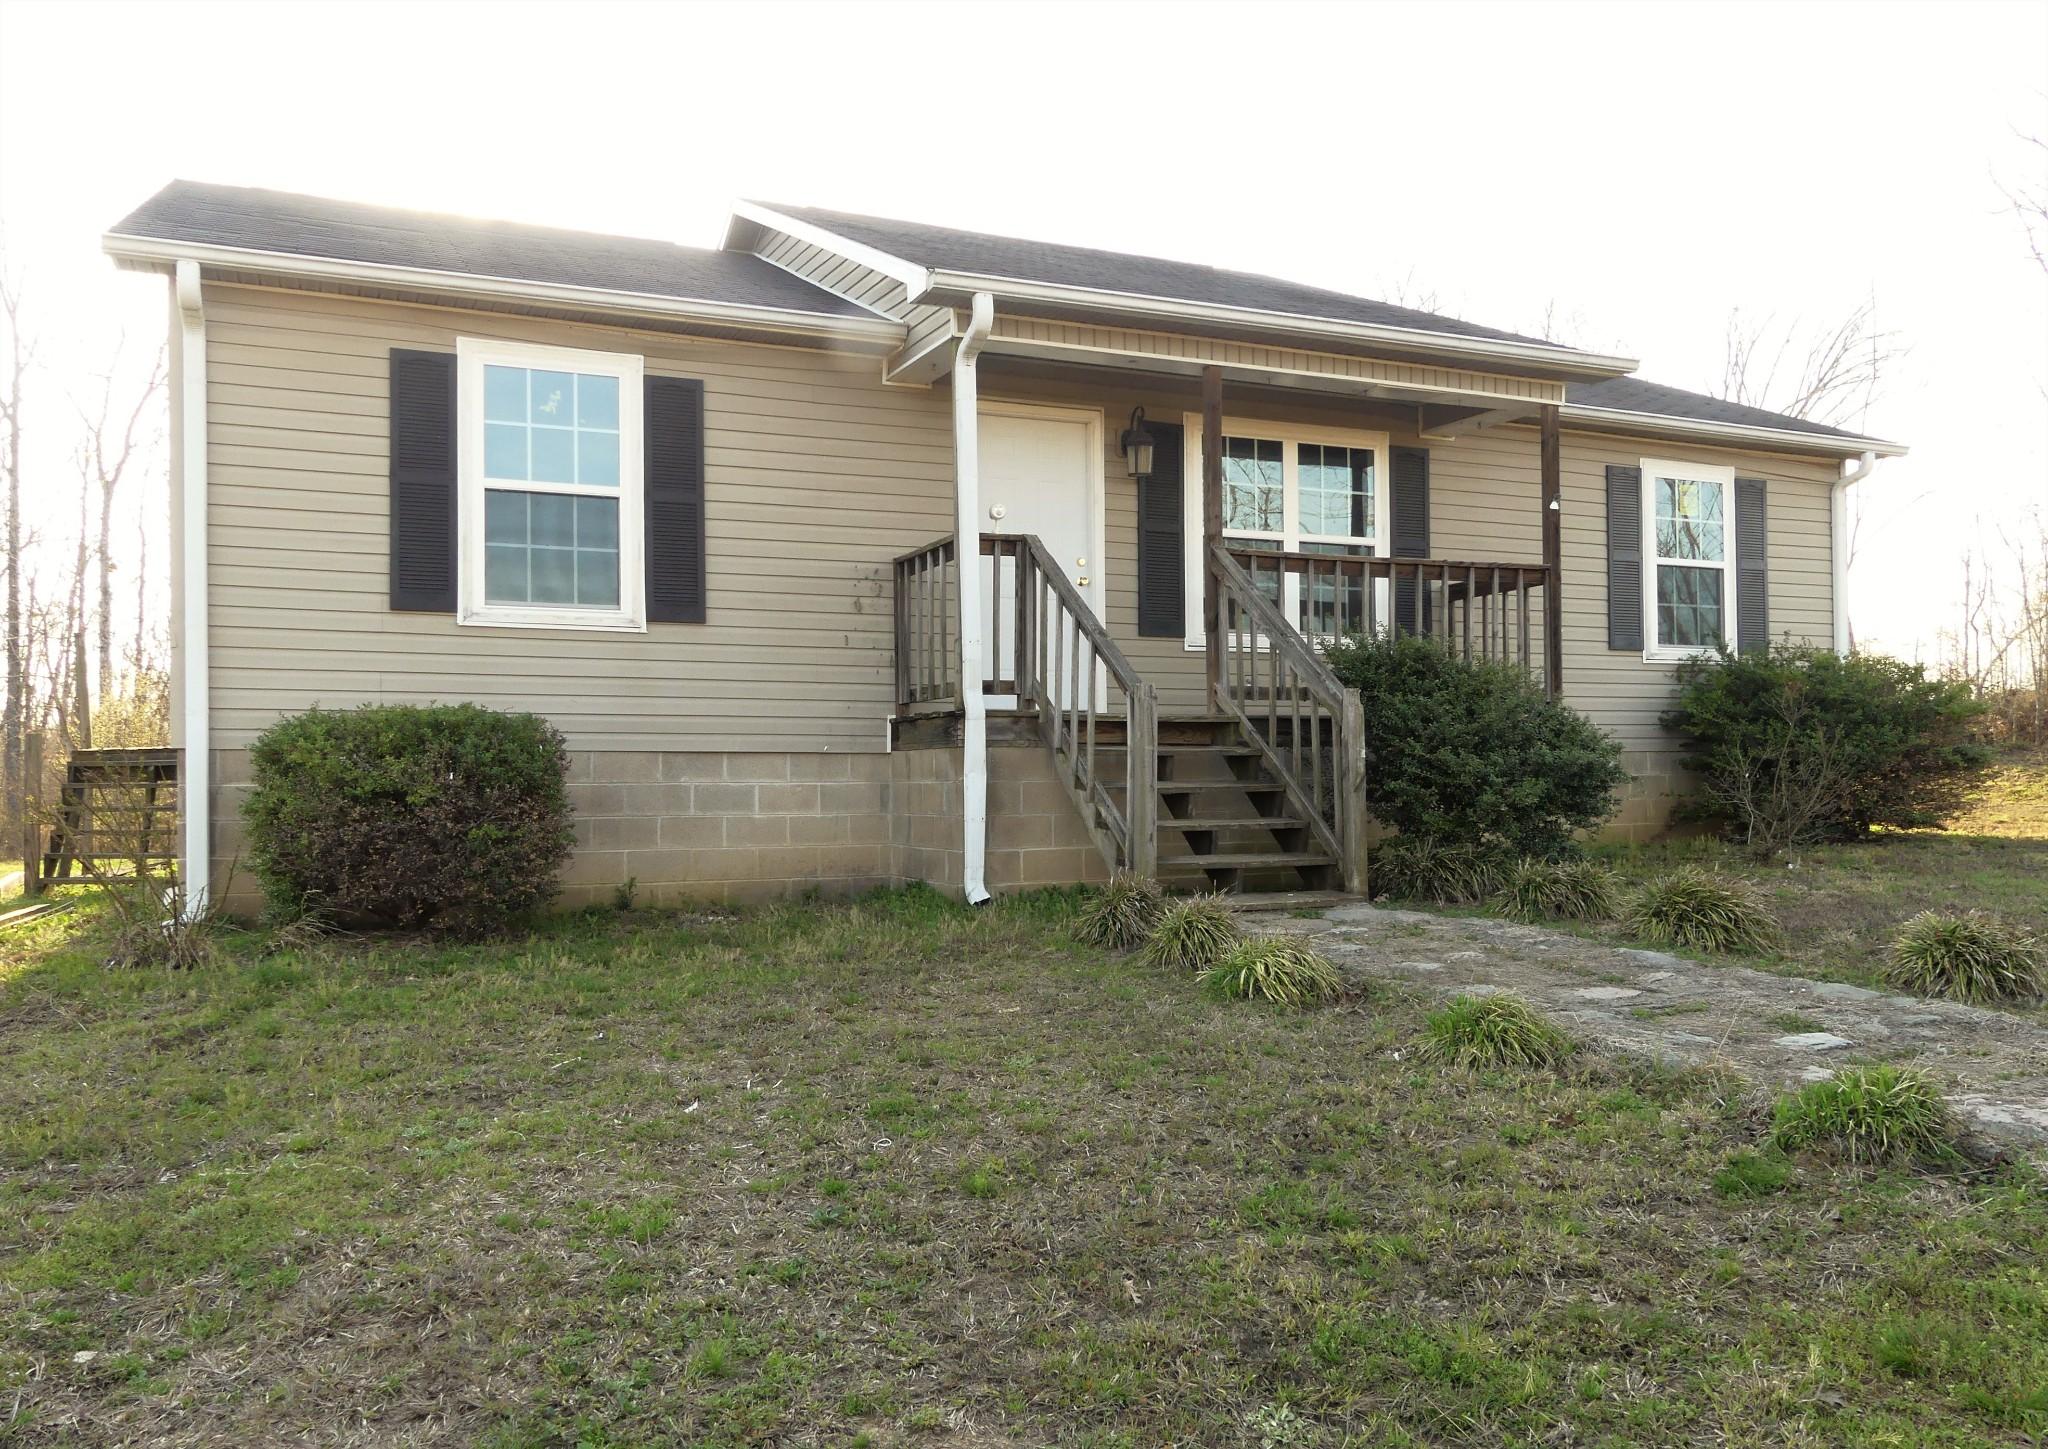 643 Iron Ln, Parsons, TN 38363 - Parsons, TN real estate listing